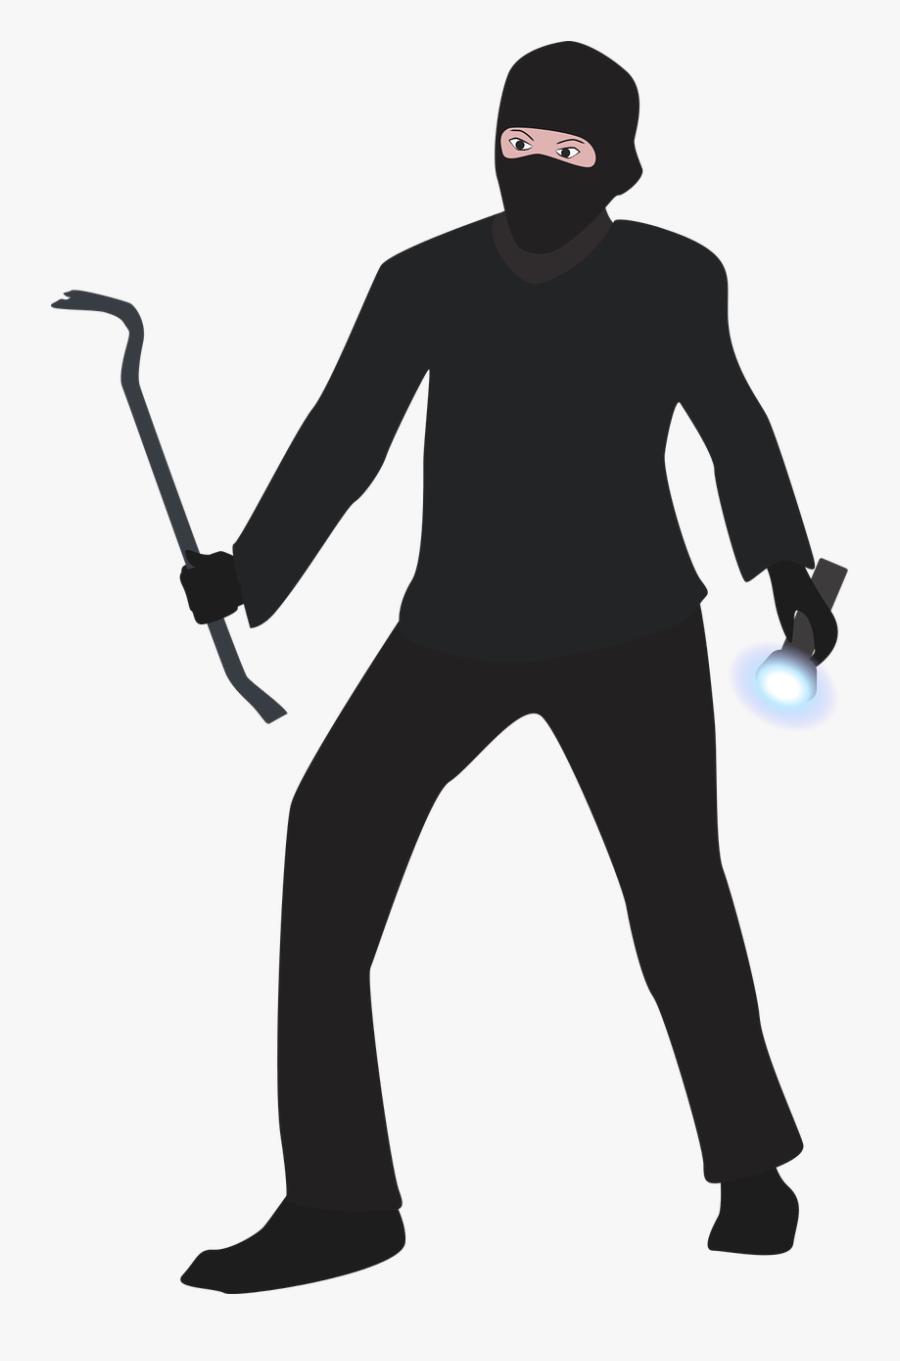 Burglar Png, Transparent Clipart